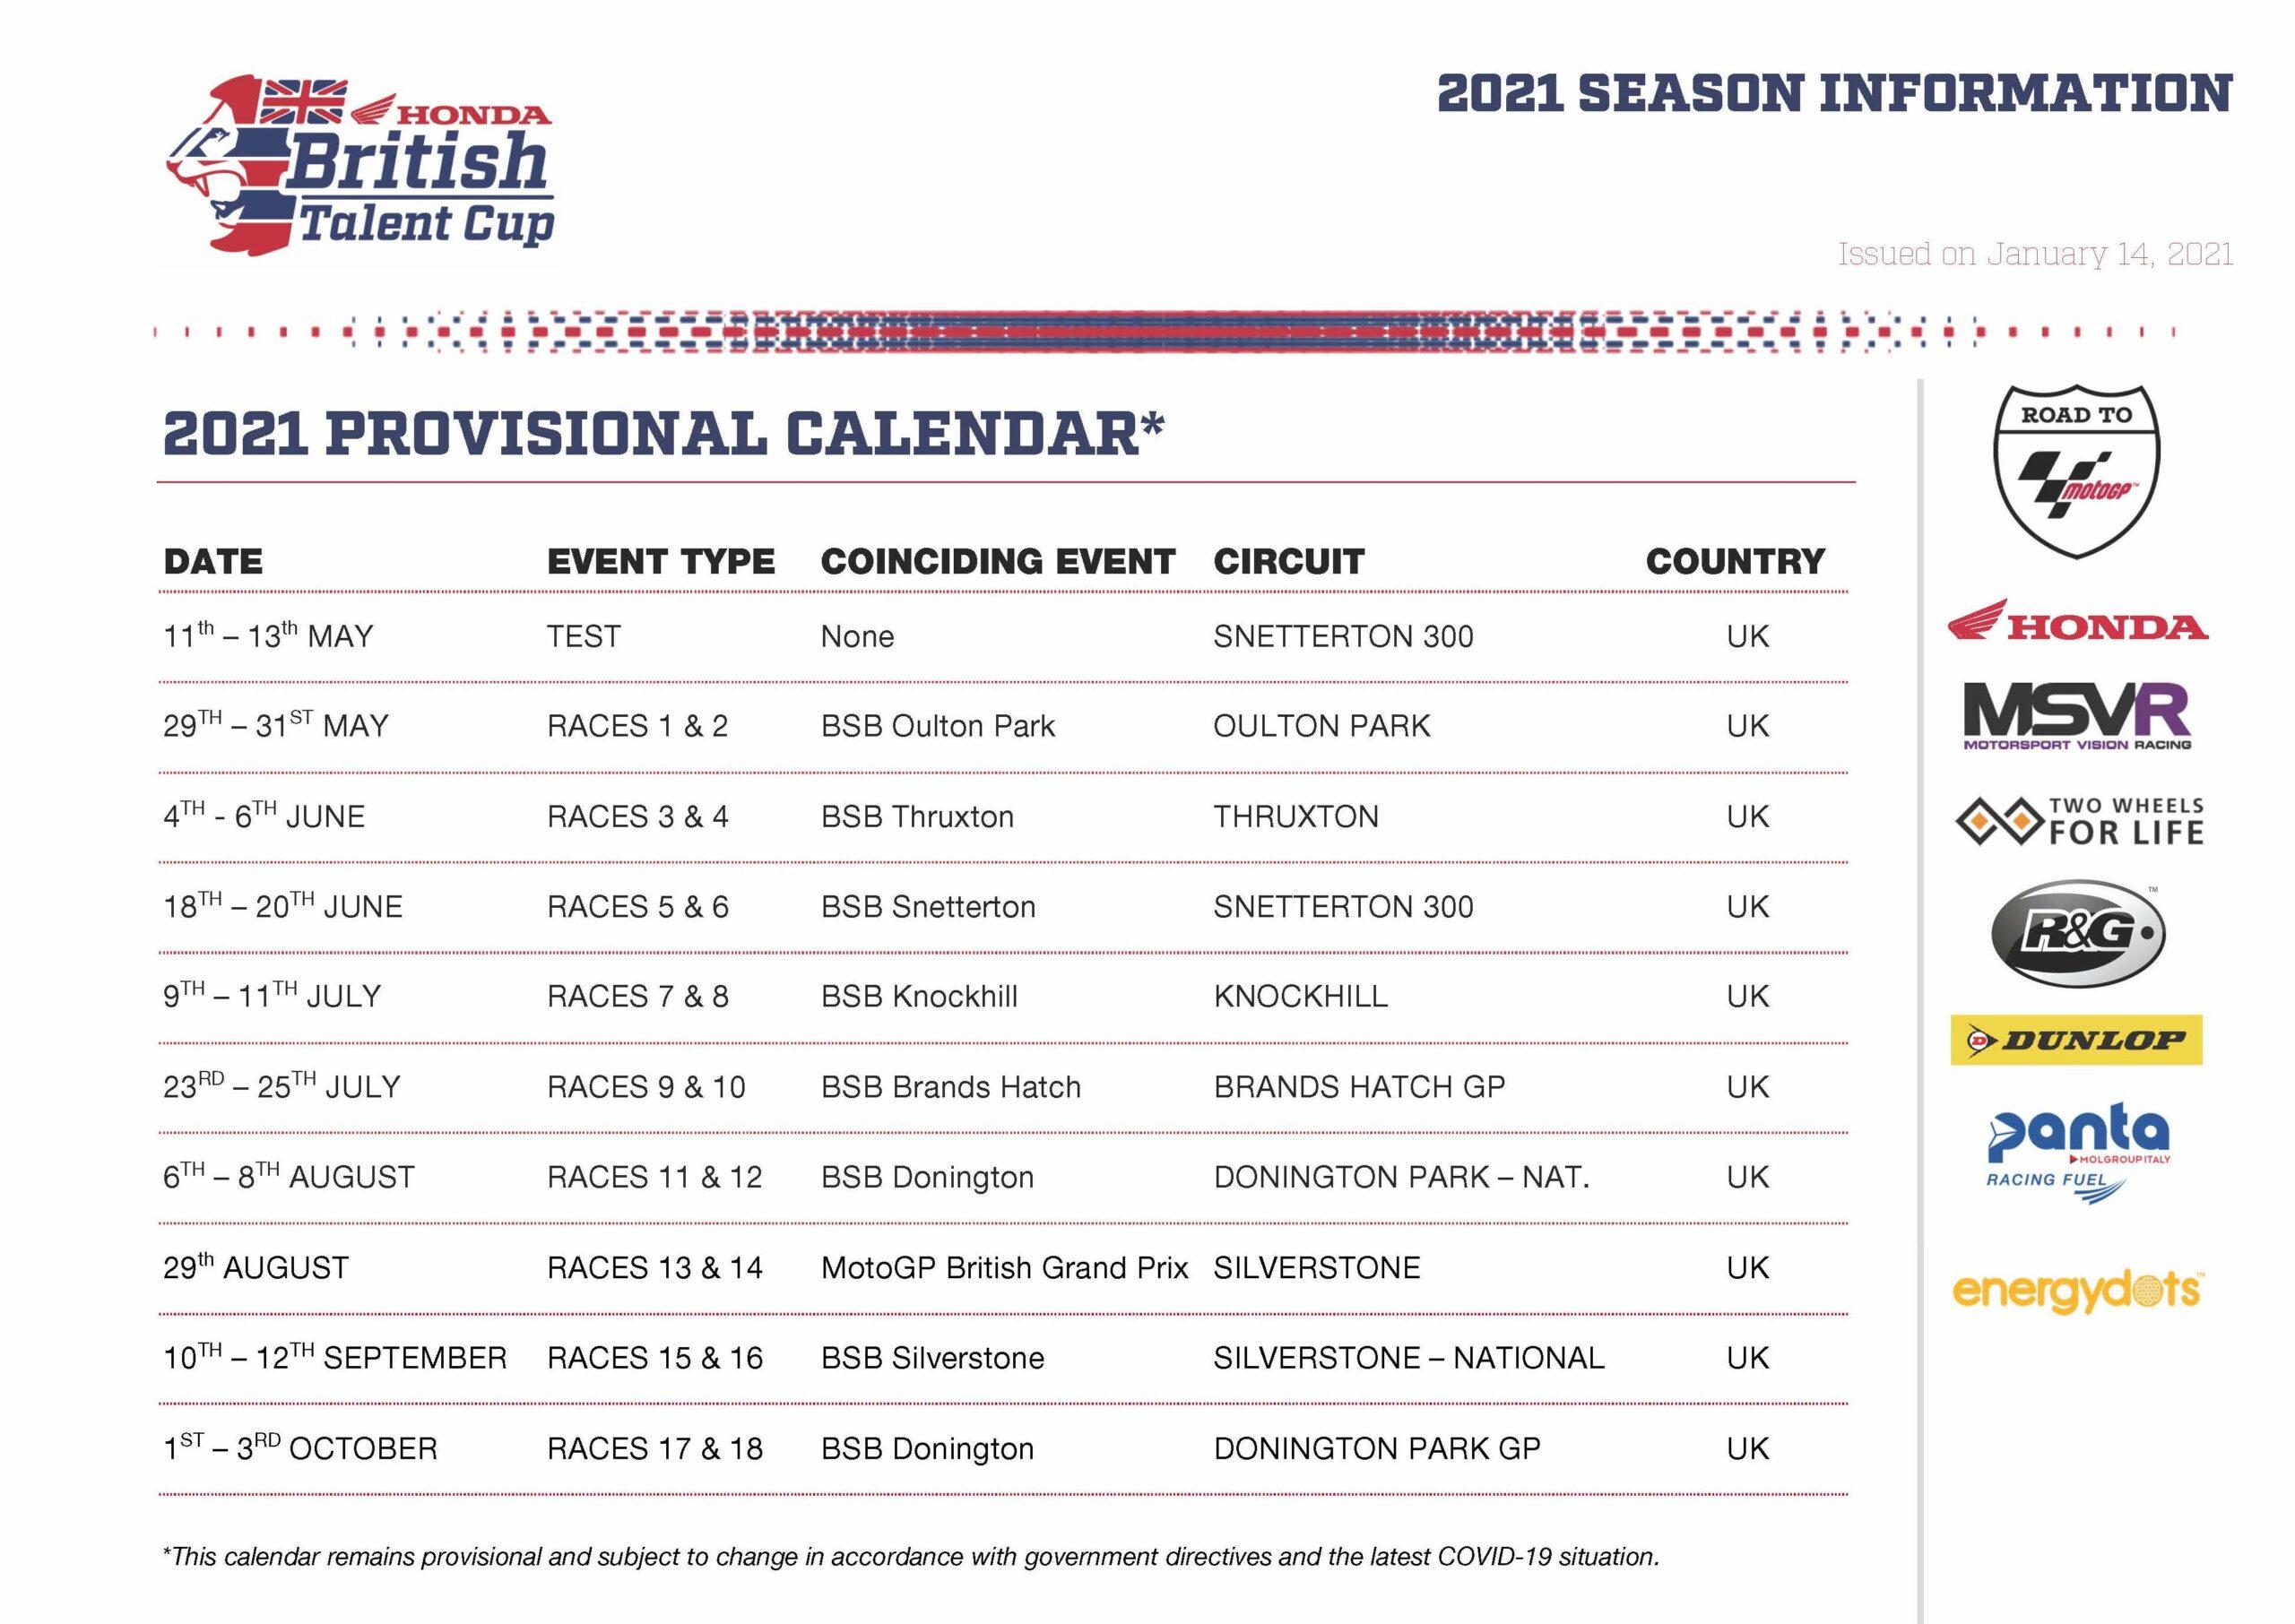 Provisional 2021 Honda British Talent Cup Calendar Updated